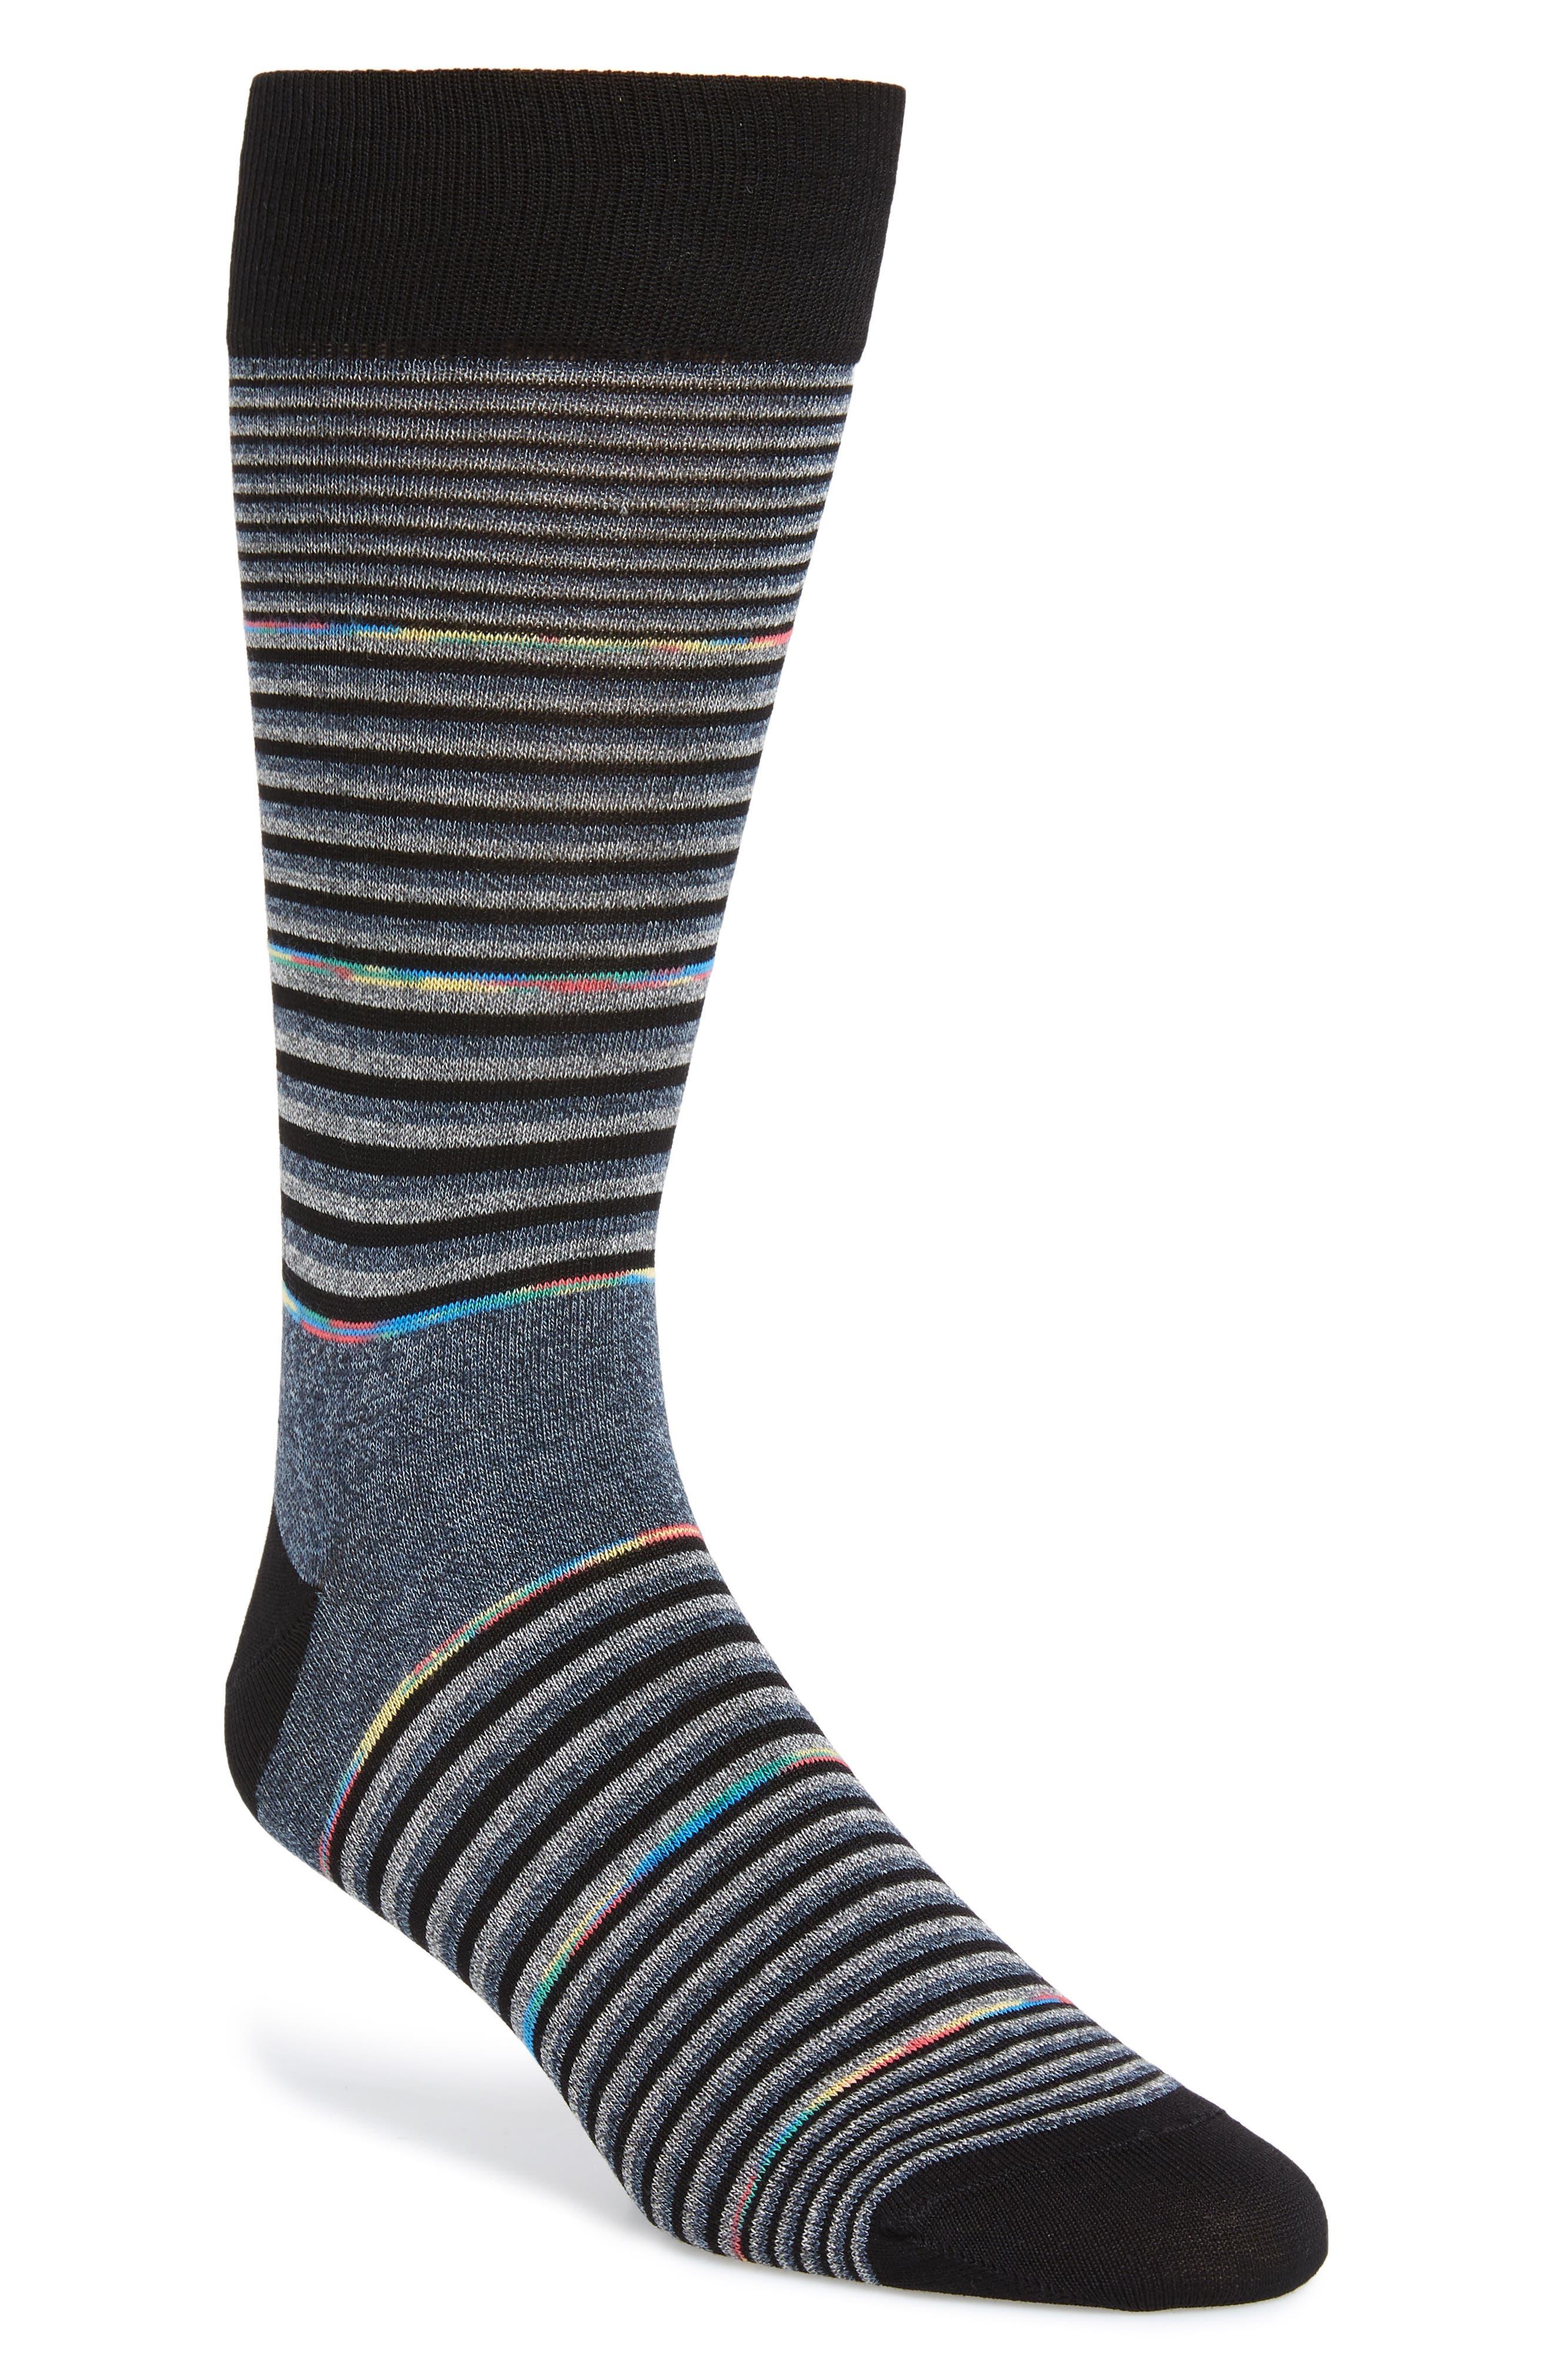 Stripe Socks,                             Main thumbnail 1, color,                             CHARCOAL